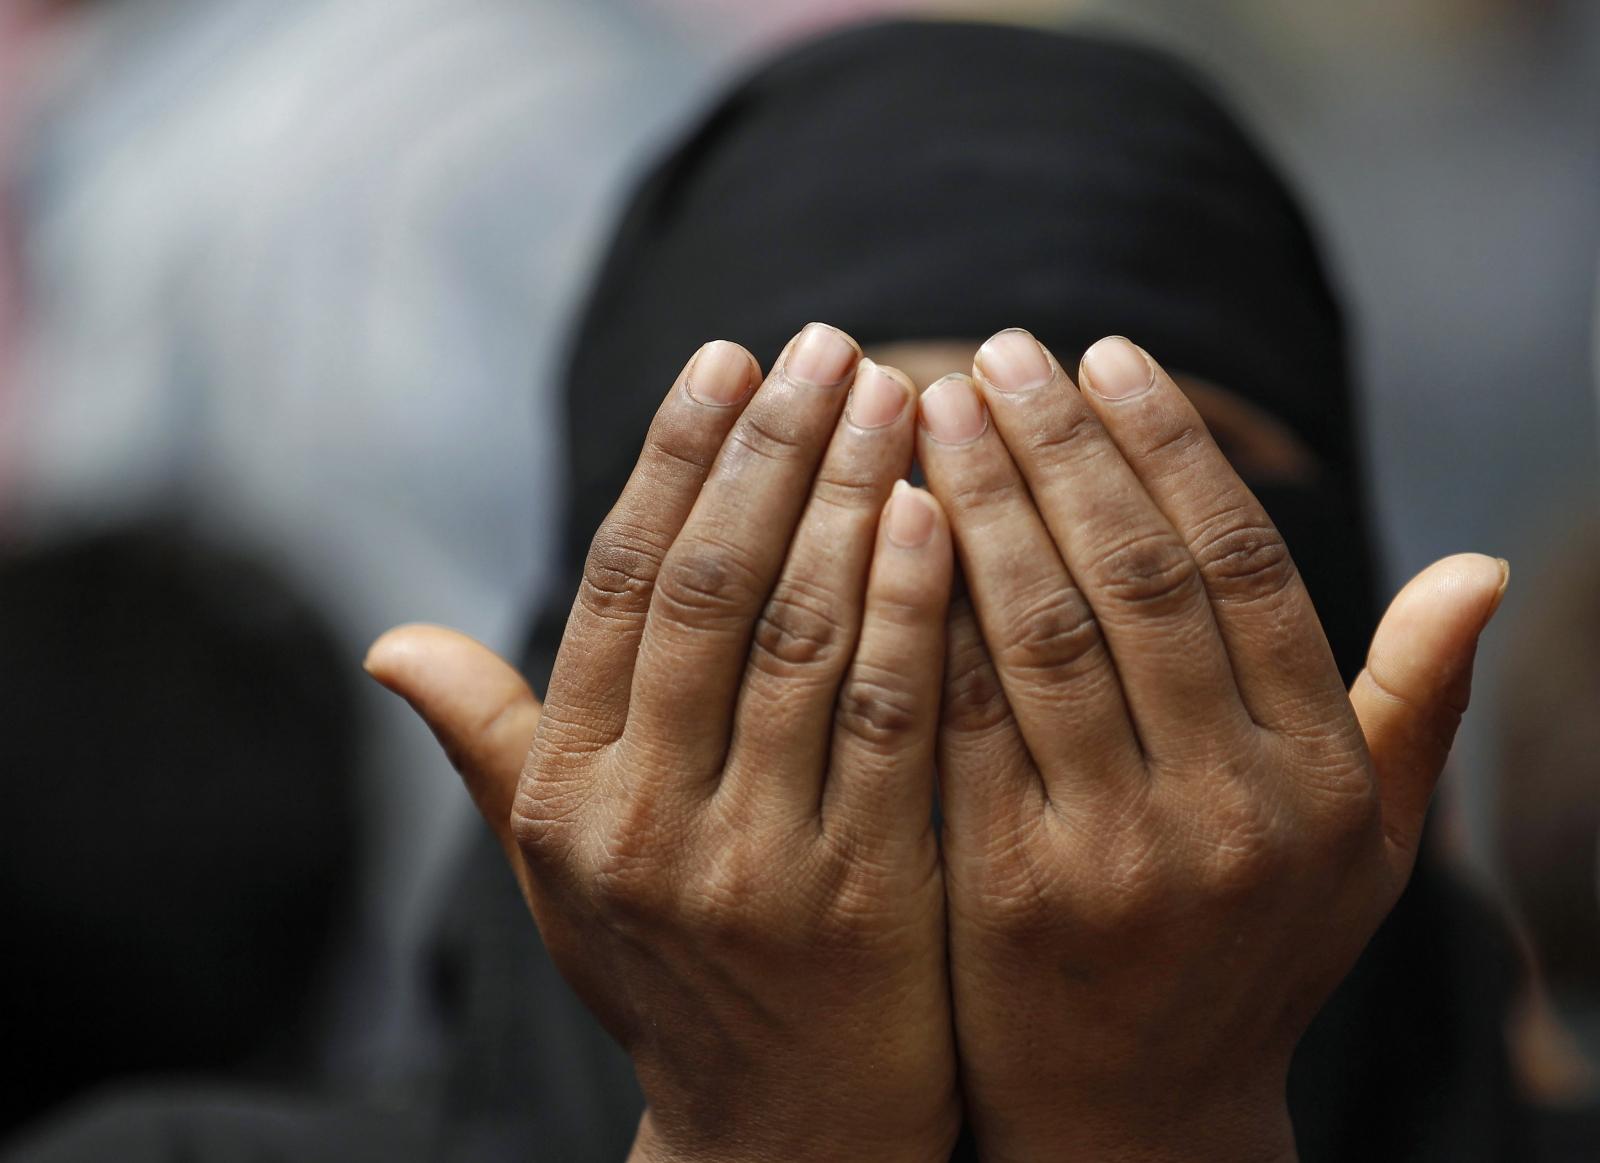 India honour killing